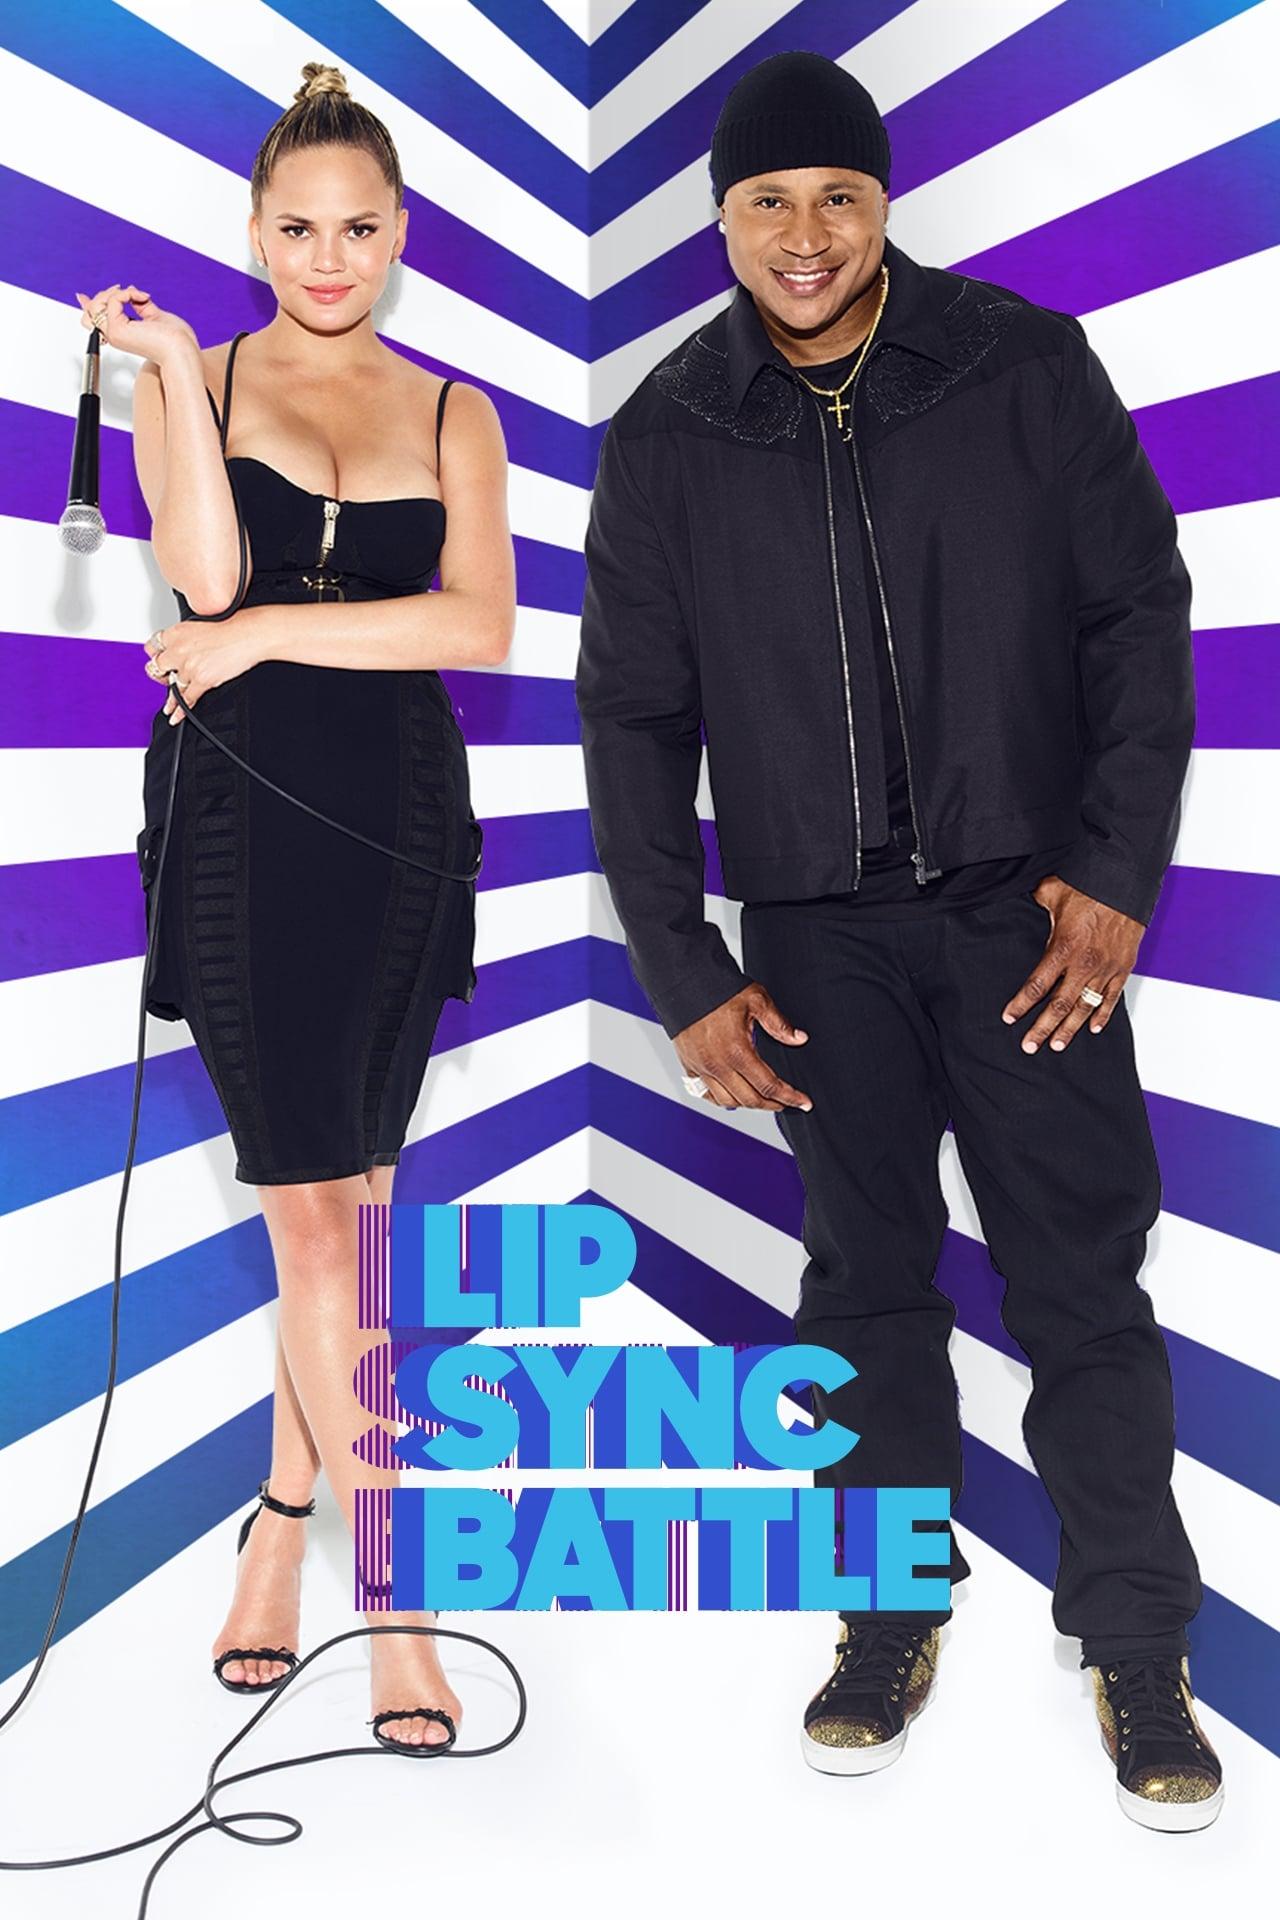 image for Lip Sync Battle